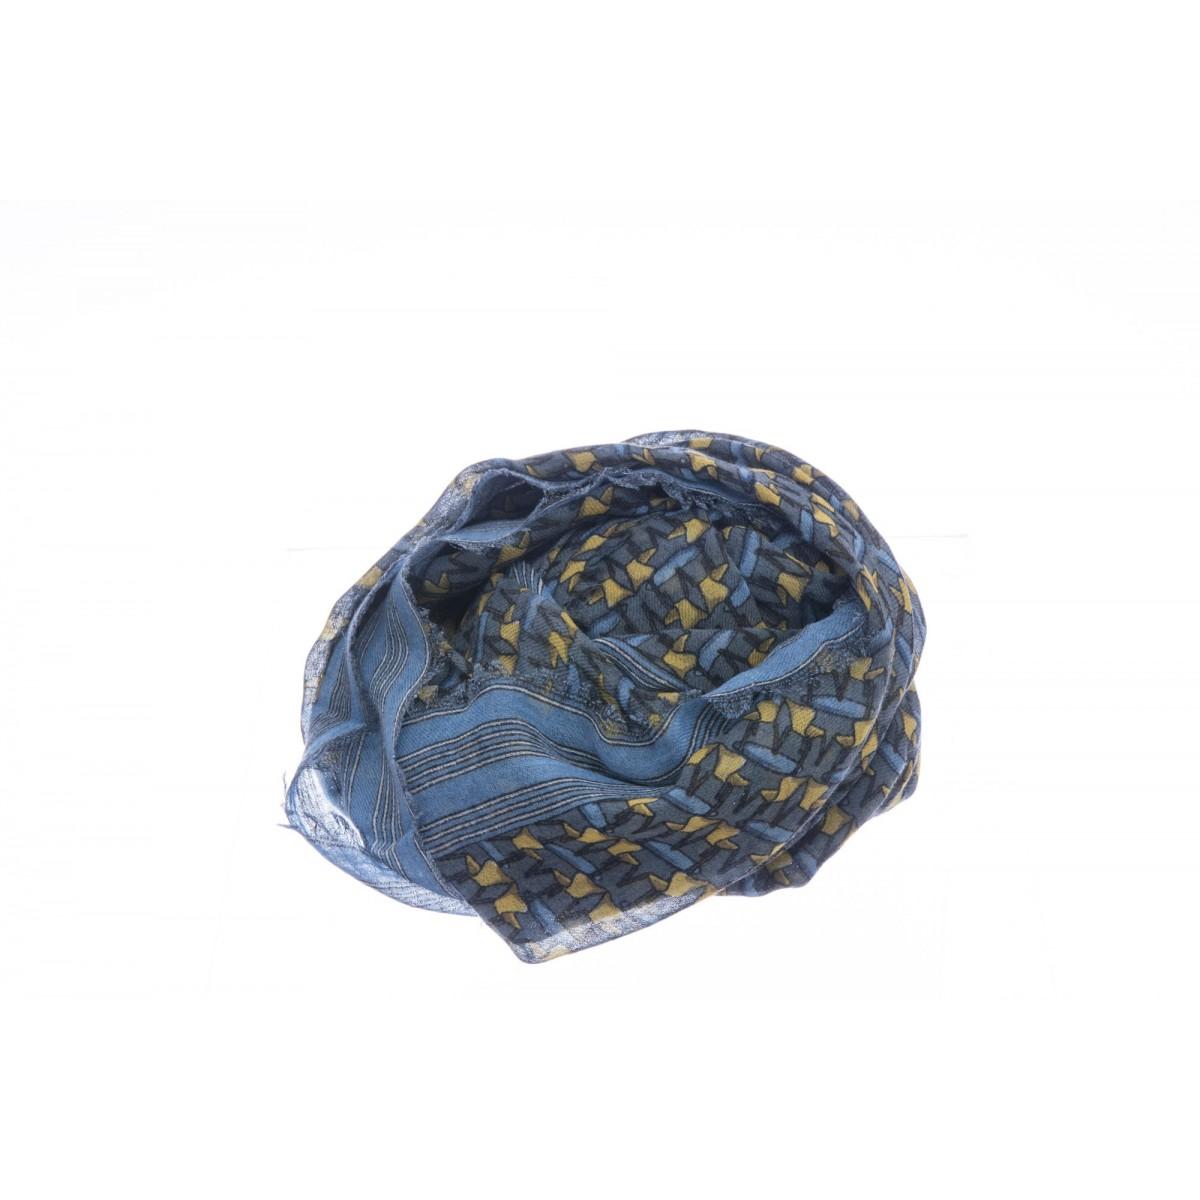 Sciarpa Camerucci - 405 chai 85% lana 15% seta